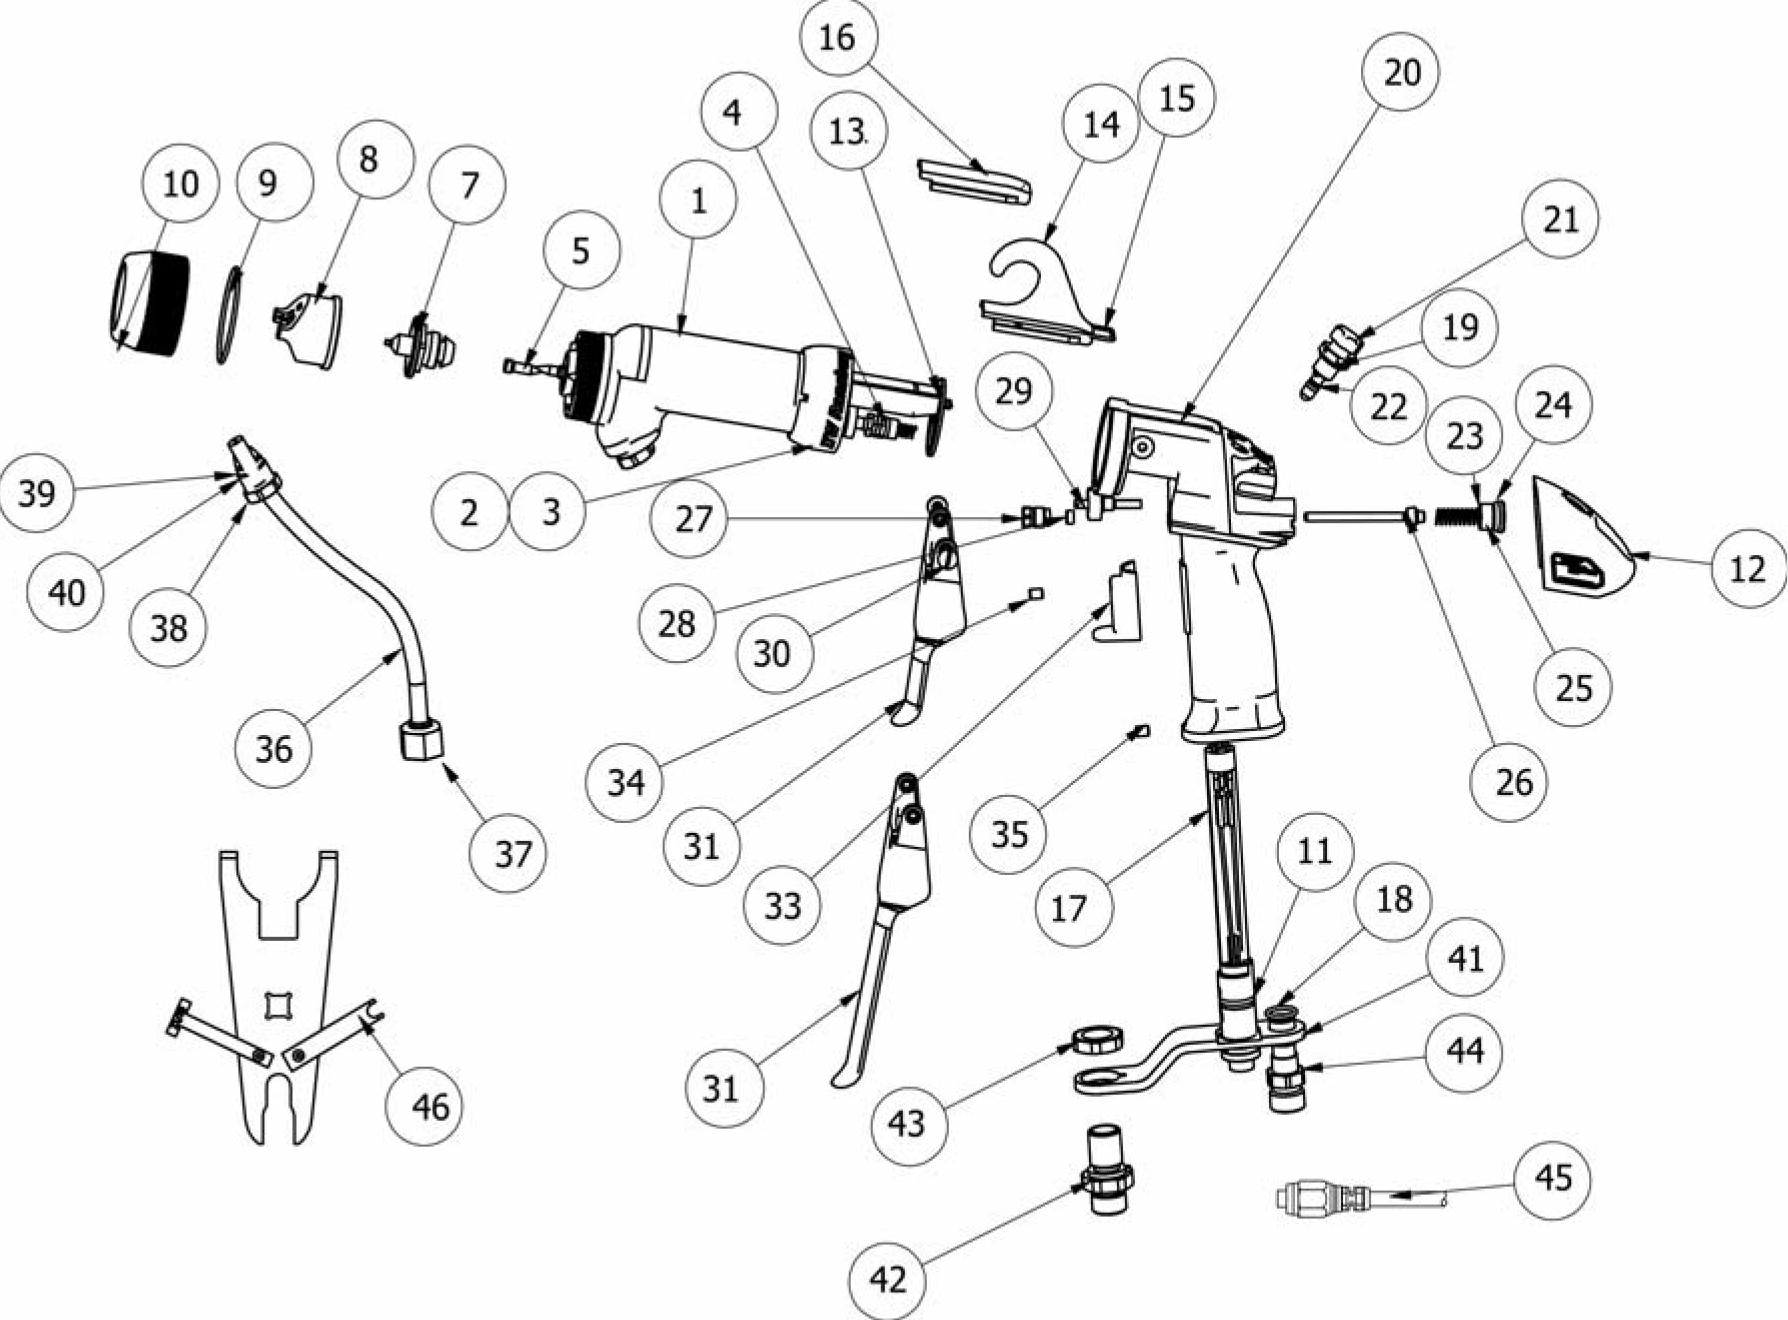 Chevy Blazer Head Diagram in addition 1997 Kia Engine Diagram moreover Kia Rio Parts Diagram also Showassembly moreover 2007 Toyota Camry Wheel Well Parts Diagram. on 2007 kia spectra body parts